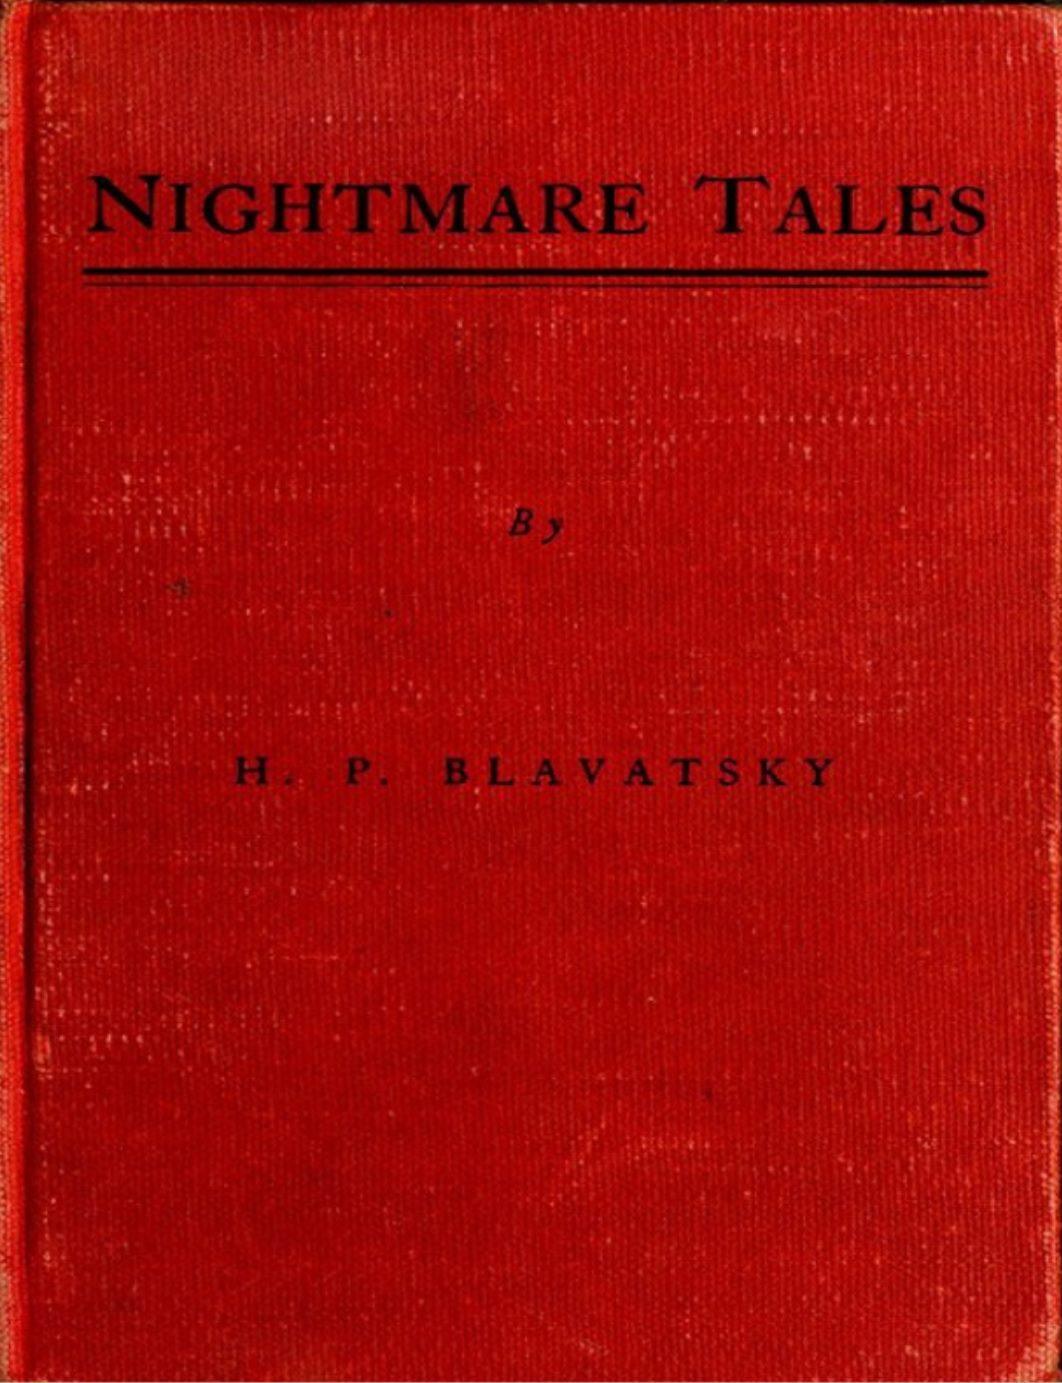 Nightmare Tales by H. P. Blavatsky by H.P.Blavatsky